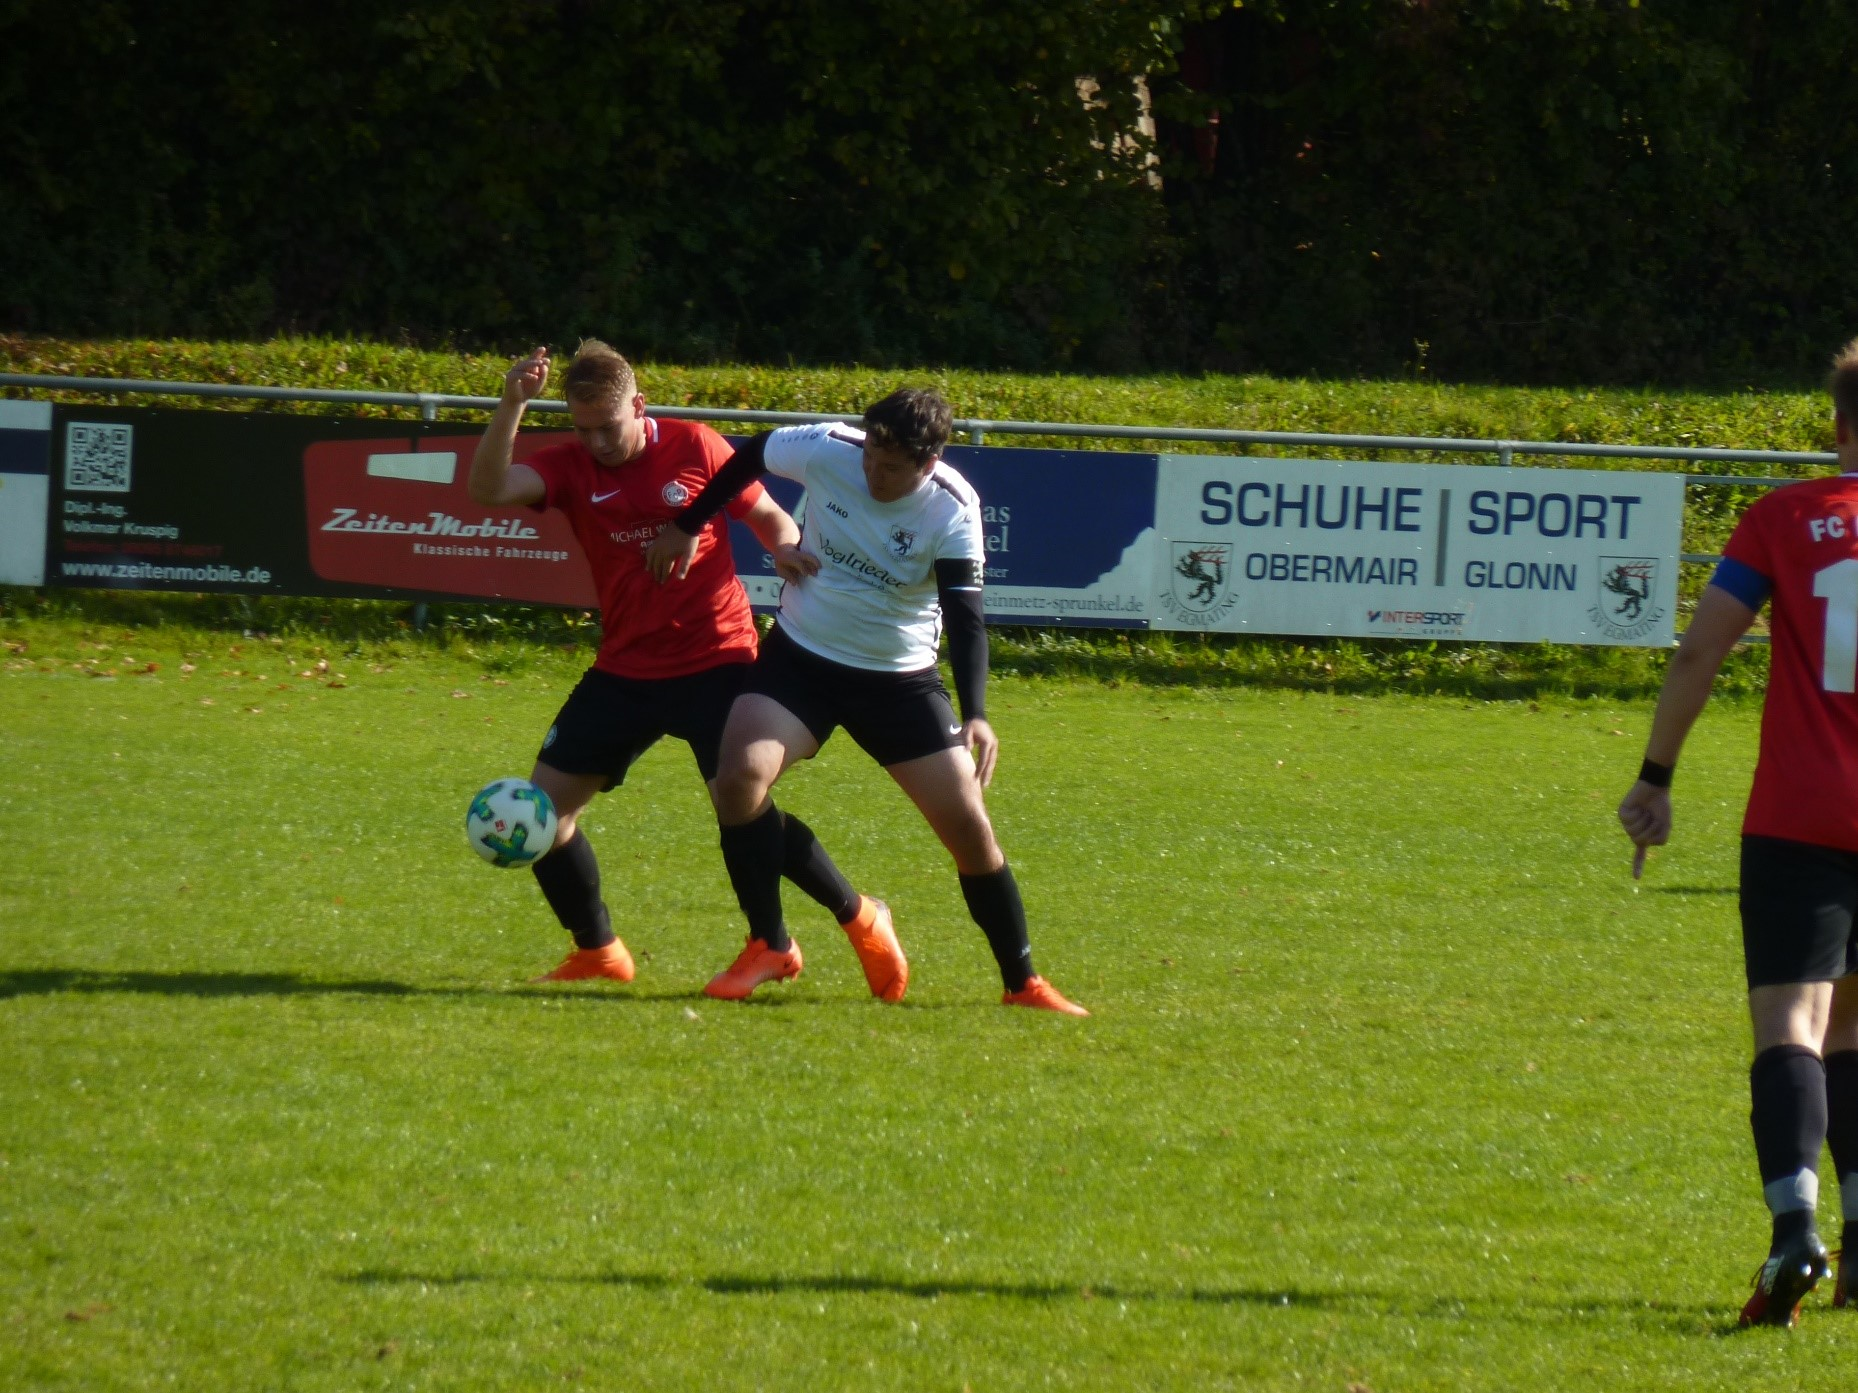 TSV Egmating 2 – FC Parsdorf2 2 : 3 (0:1)